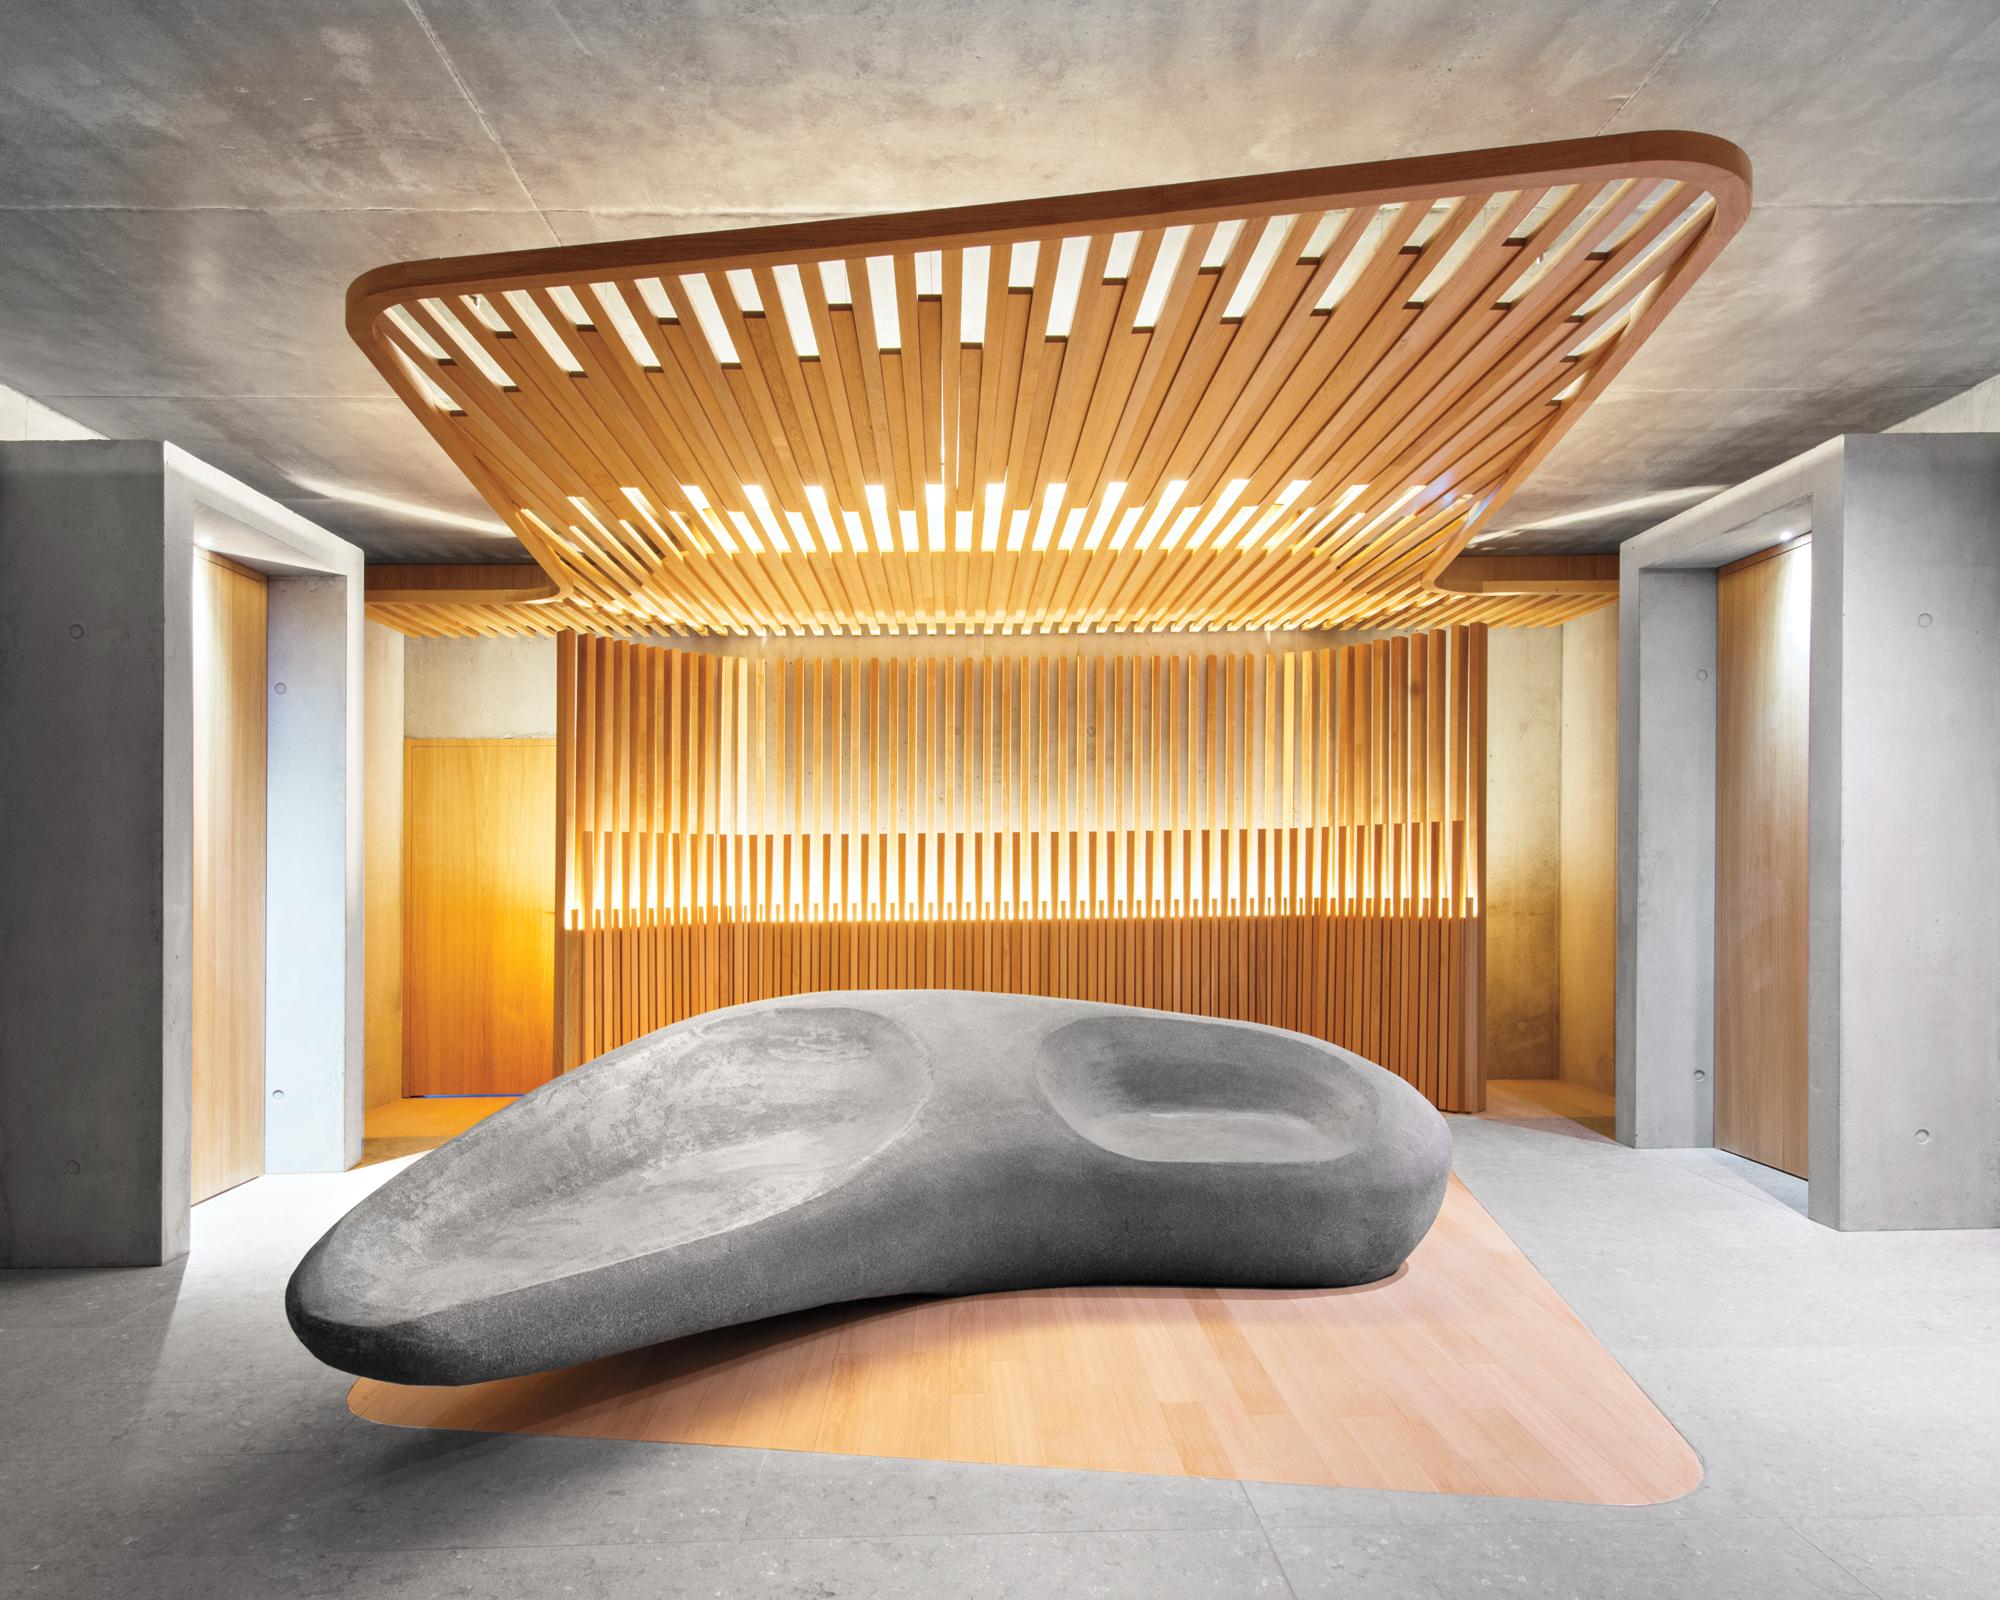 Jouin manku designs sensory annex for h tel des berges in for Hotel design spa france